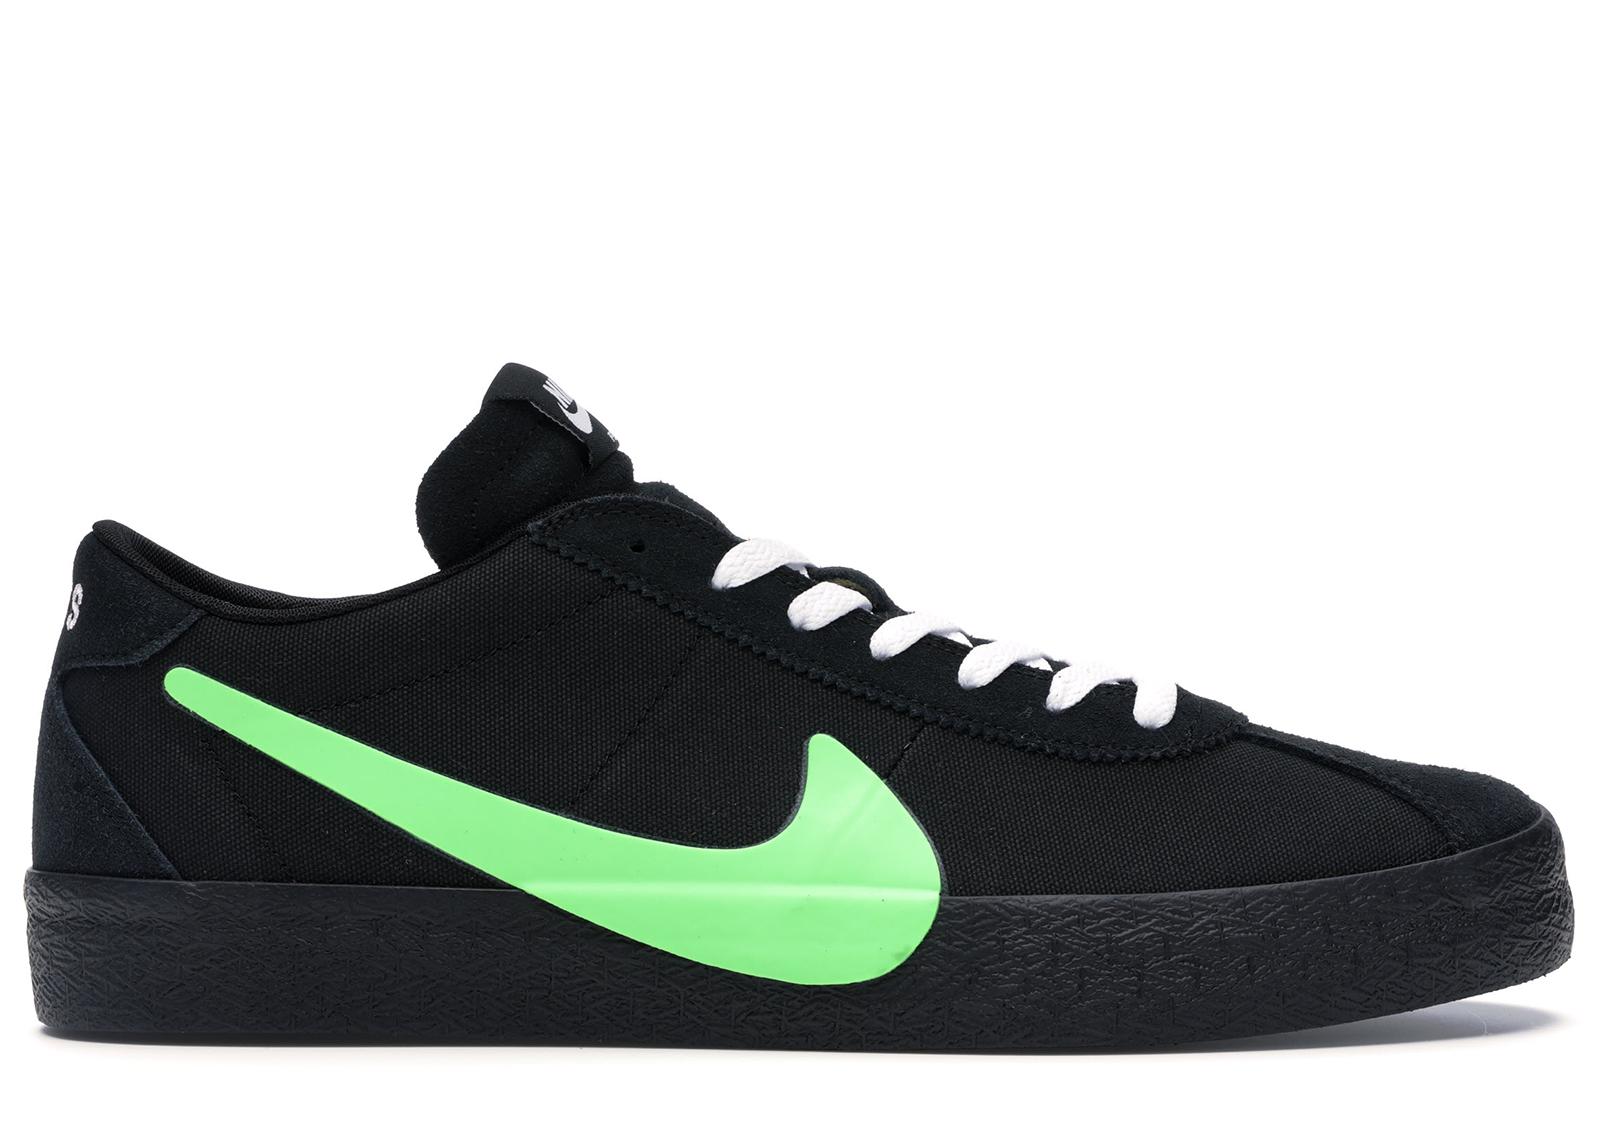 Nike SB Bruin The Poets - CU3211-001